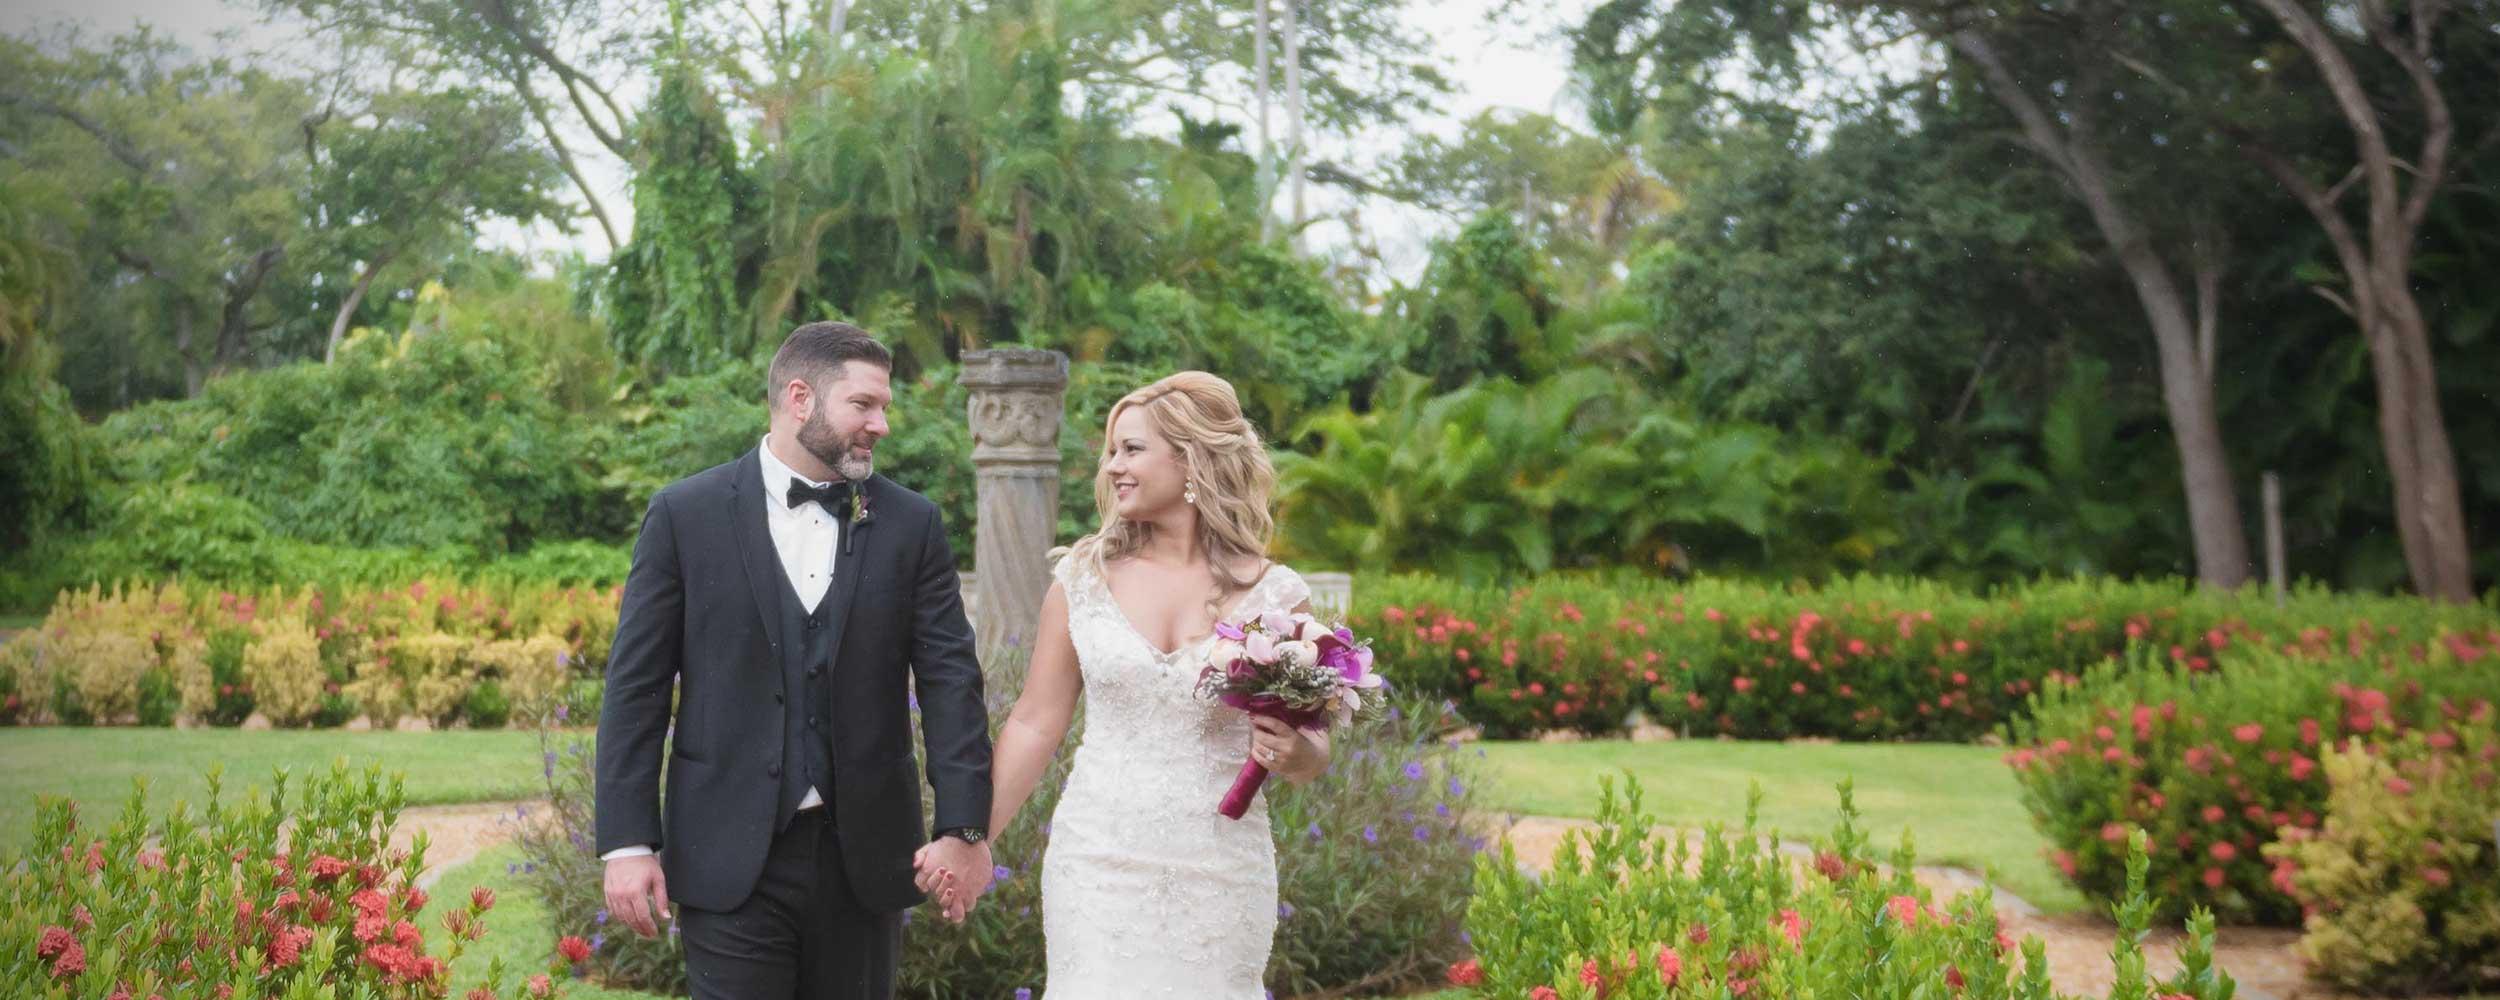 weddings-photography-video-bg2500x1000.v2